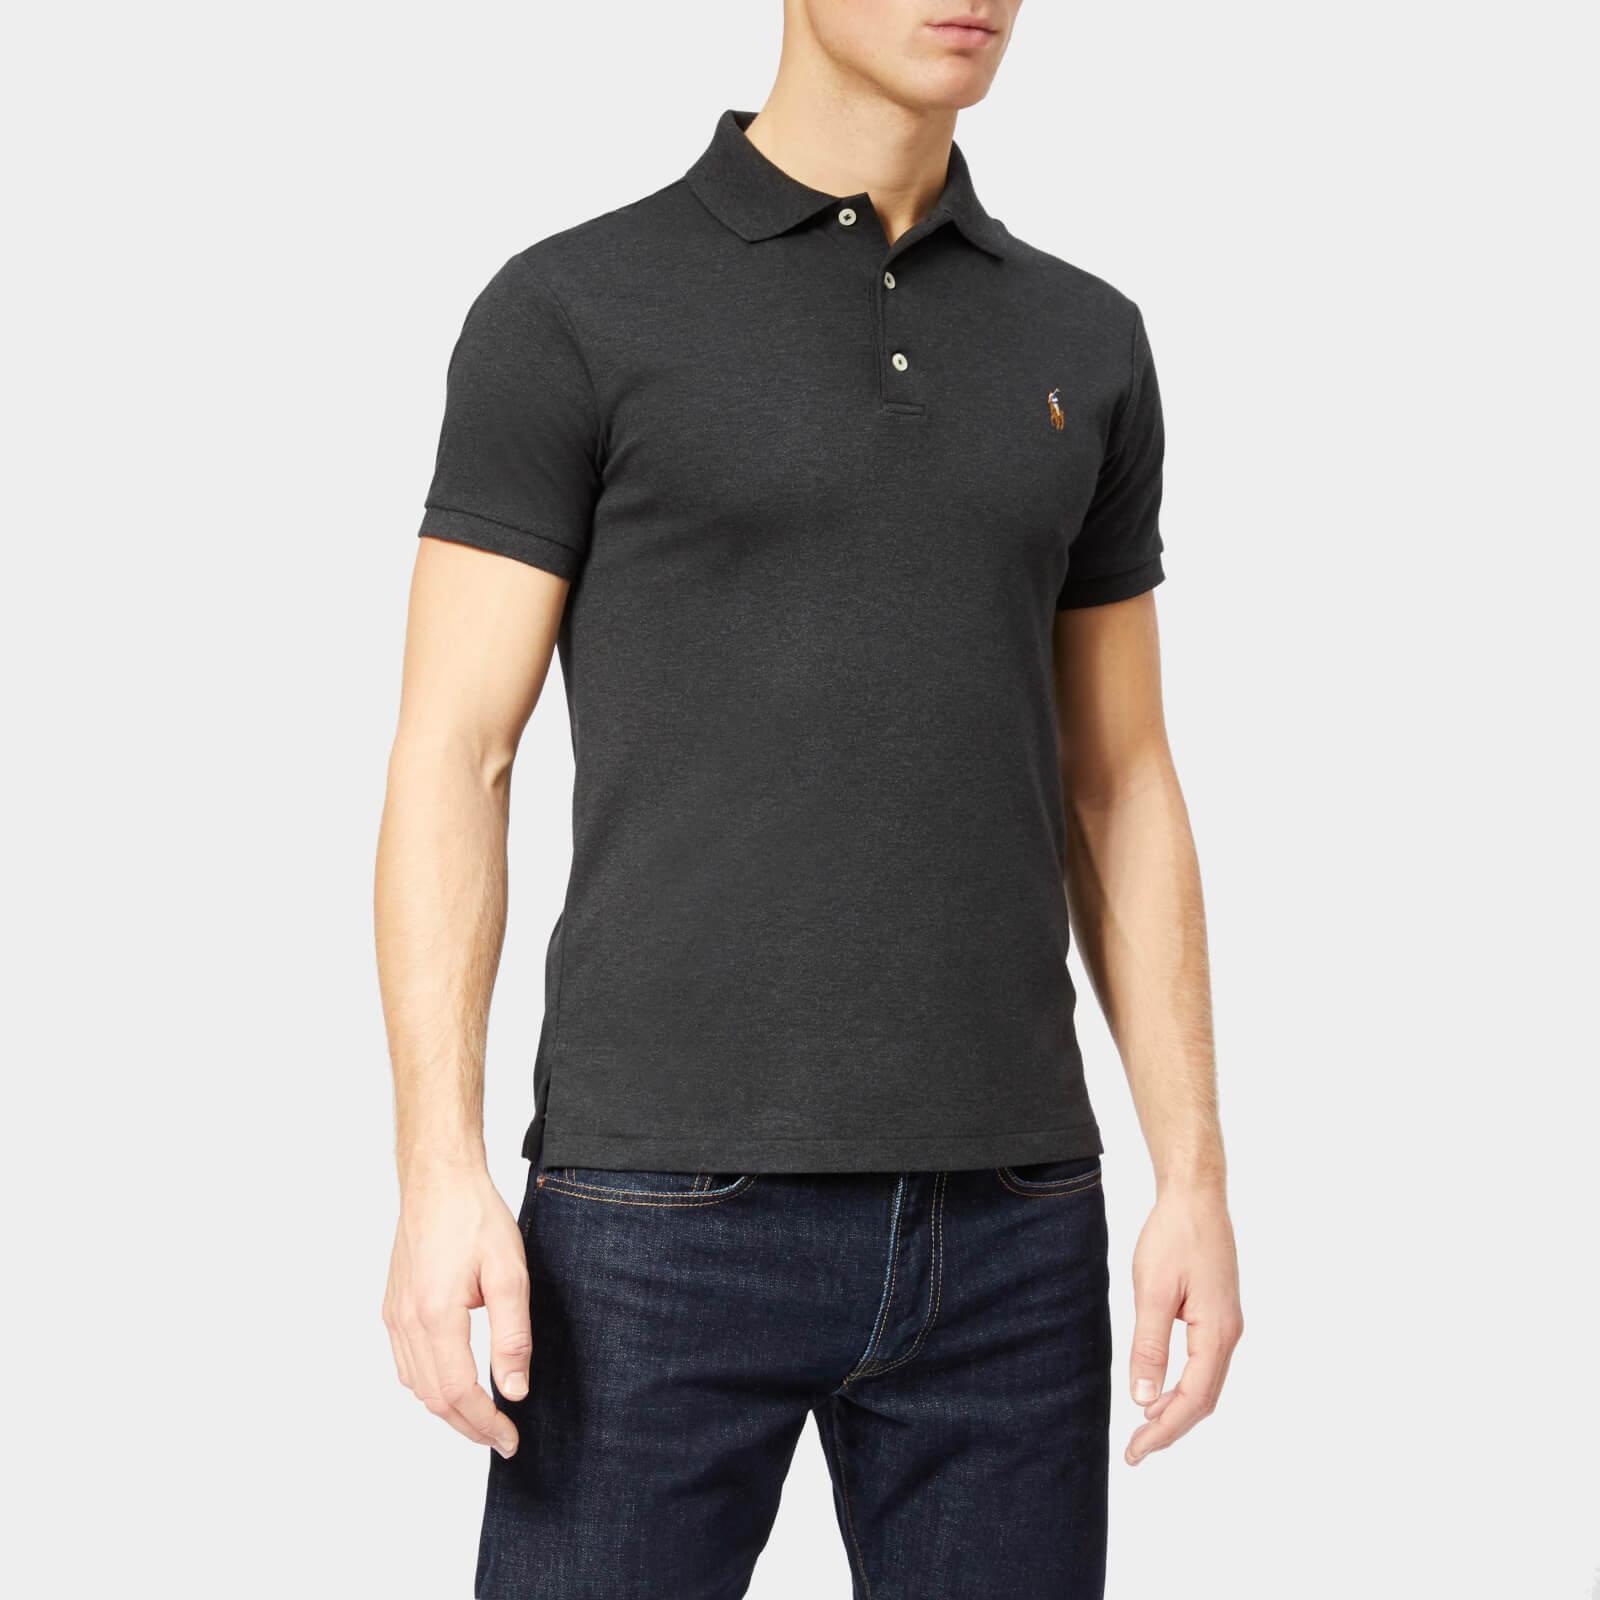 980fc6283cb9 Polo Ralph Lauren Men s Pima Short Sleeve Polo Shirt - Dark Granite Heather  - Free UK Delivery over £50